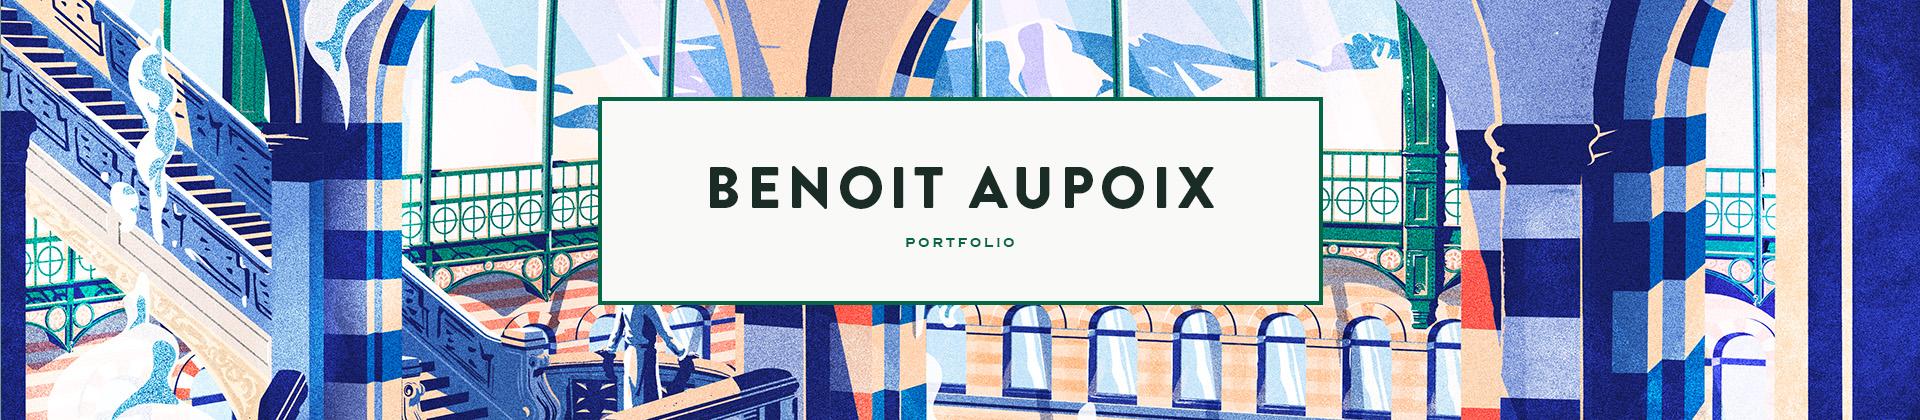 Benoit Aupoix